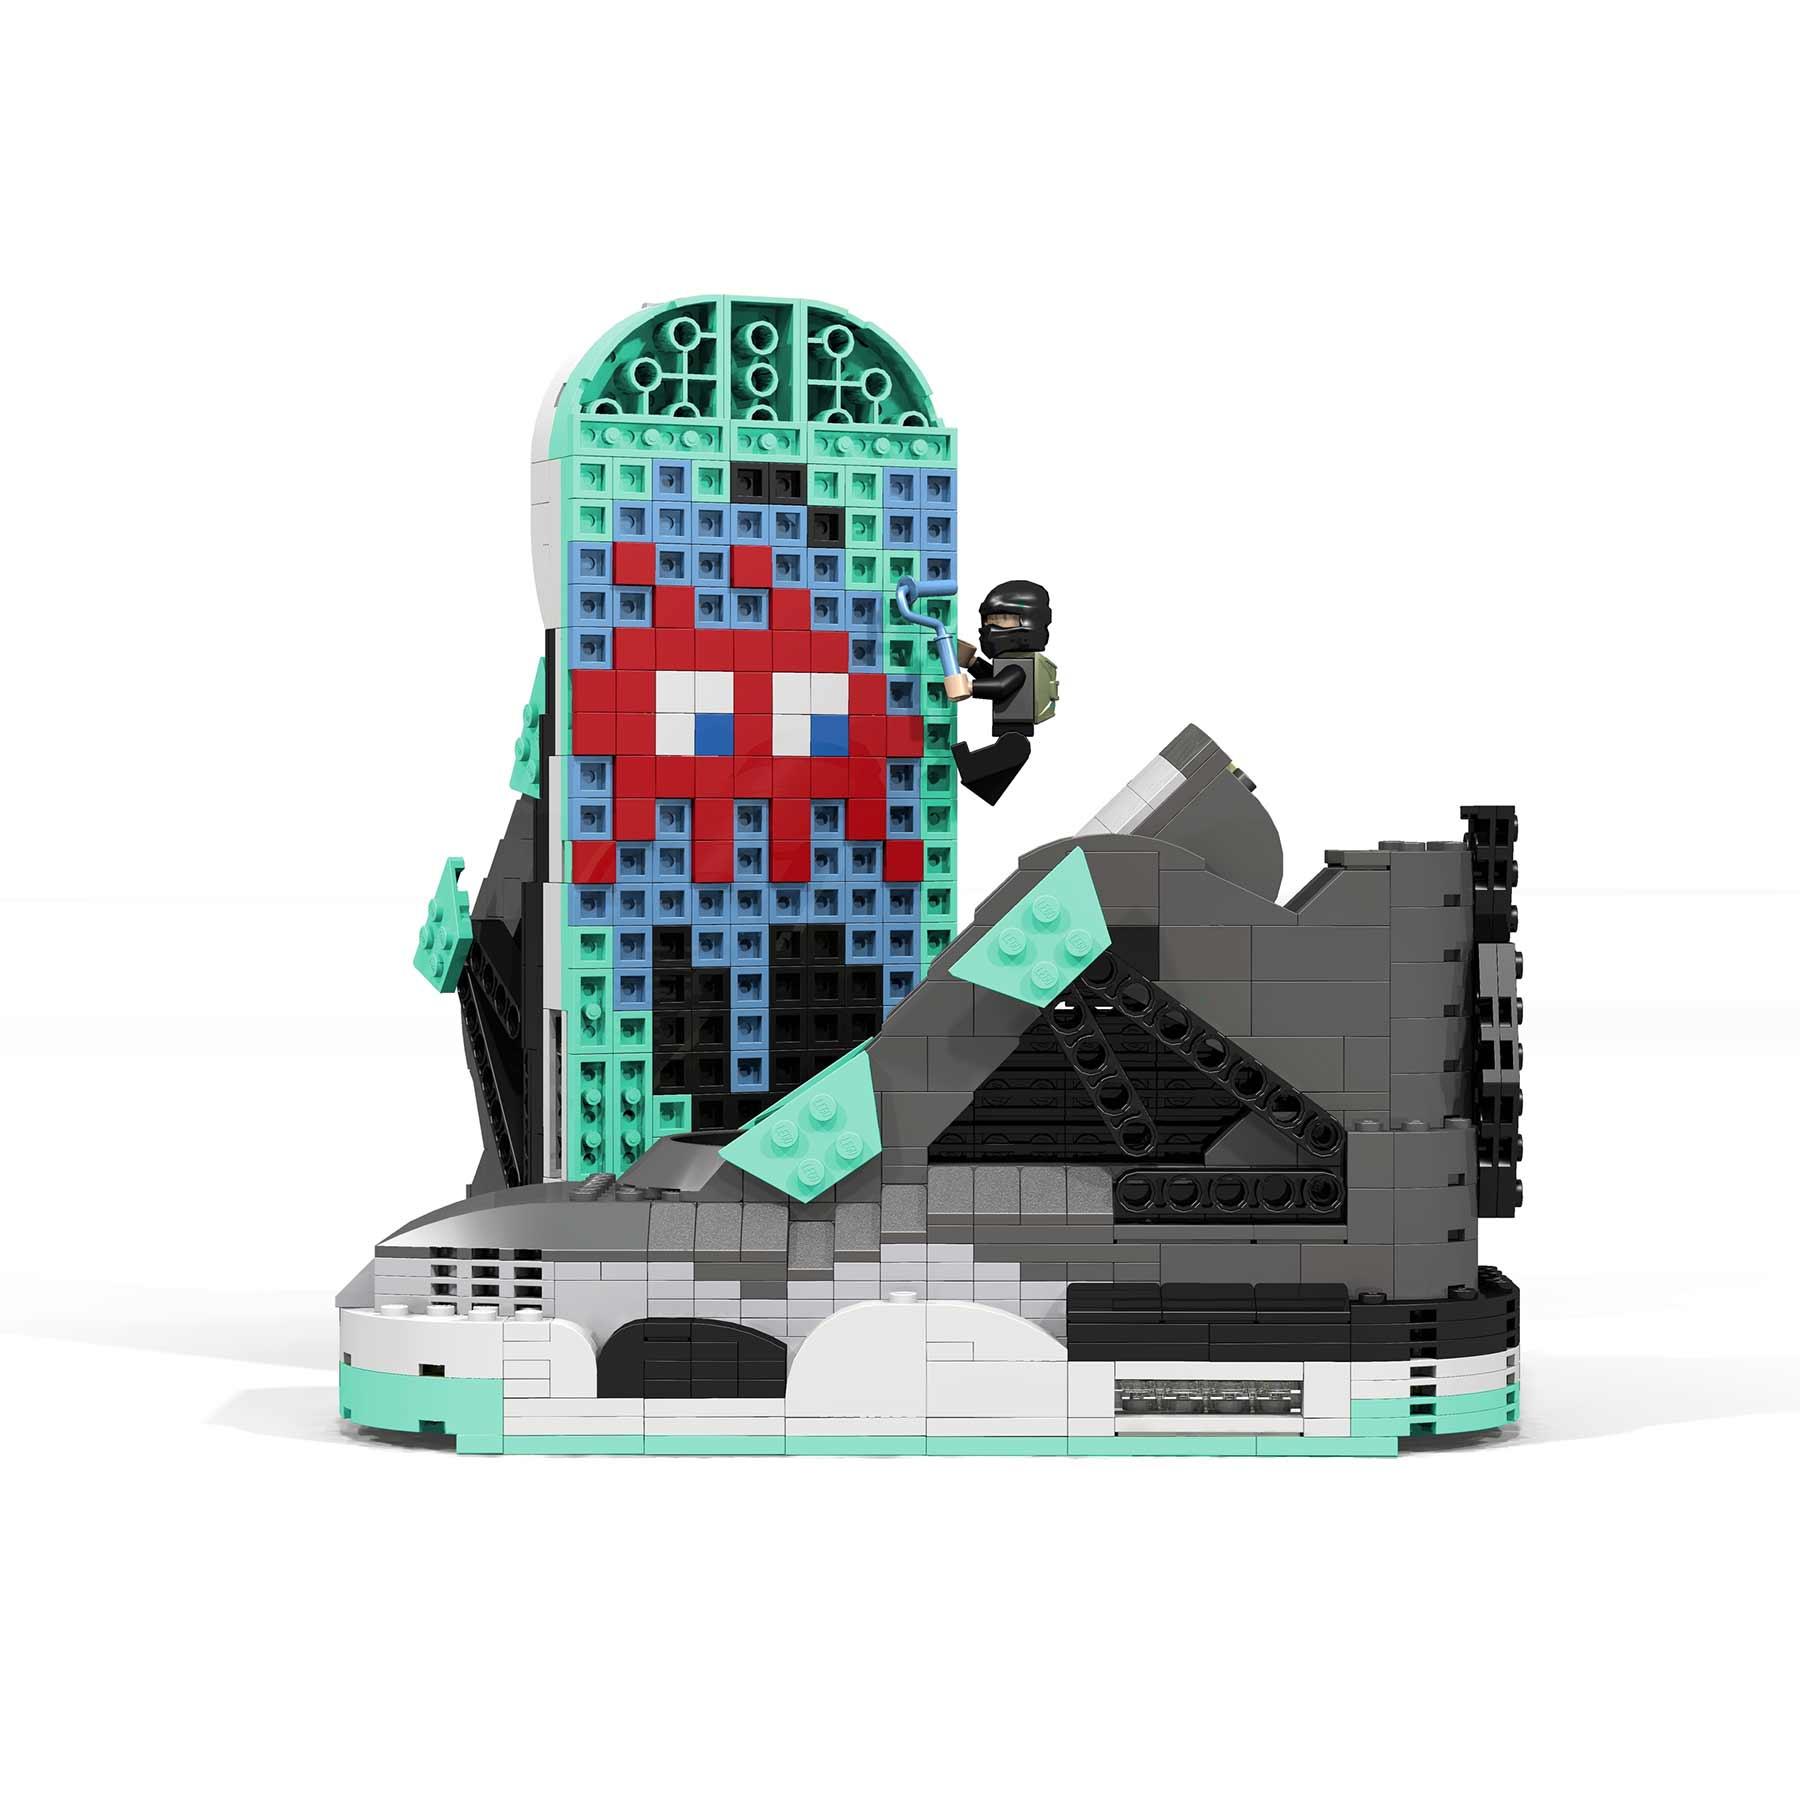 LEGO-Sneaker von Tom Yoo LEGO-Sneaker-Tom-Yoo_03